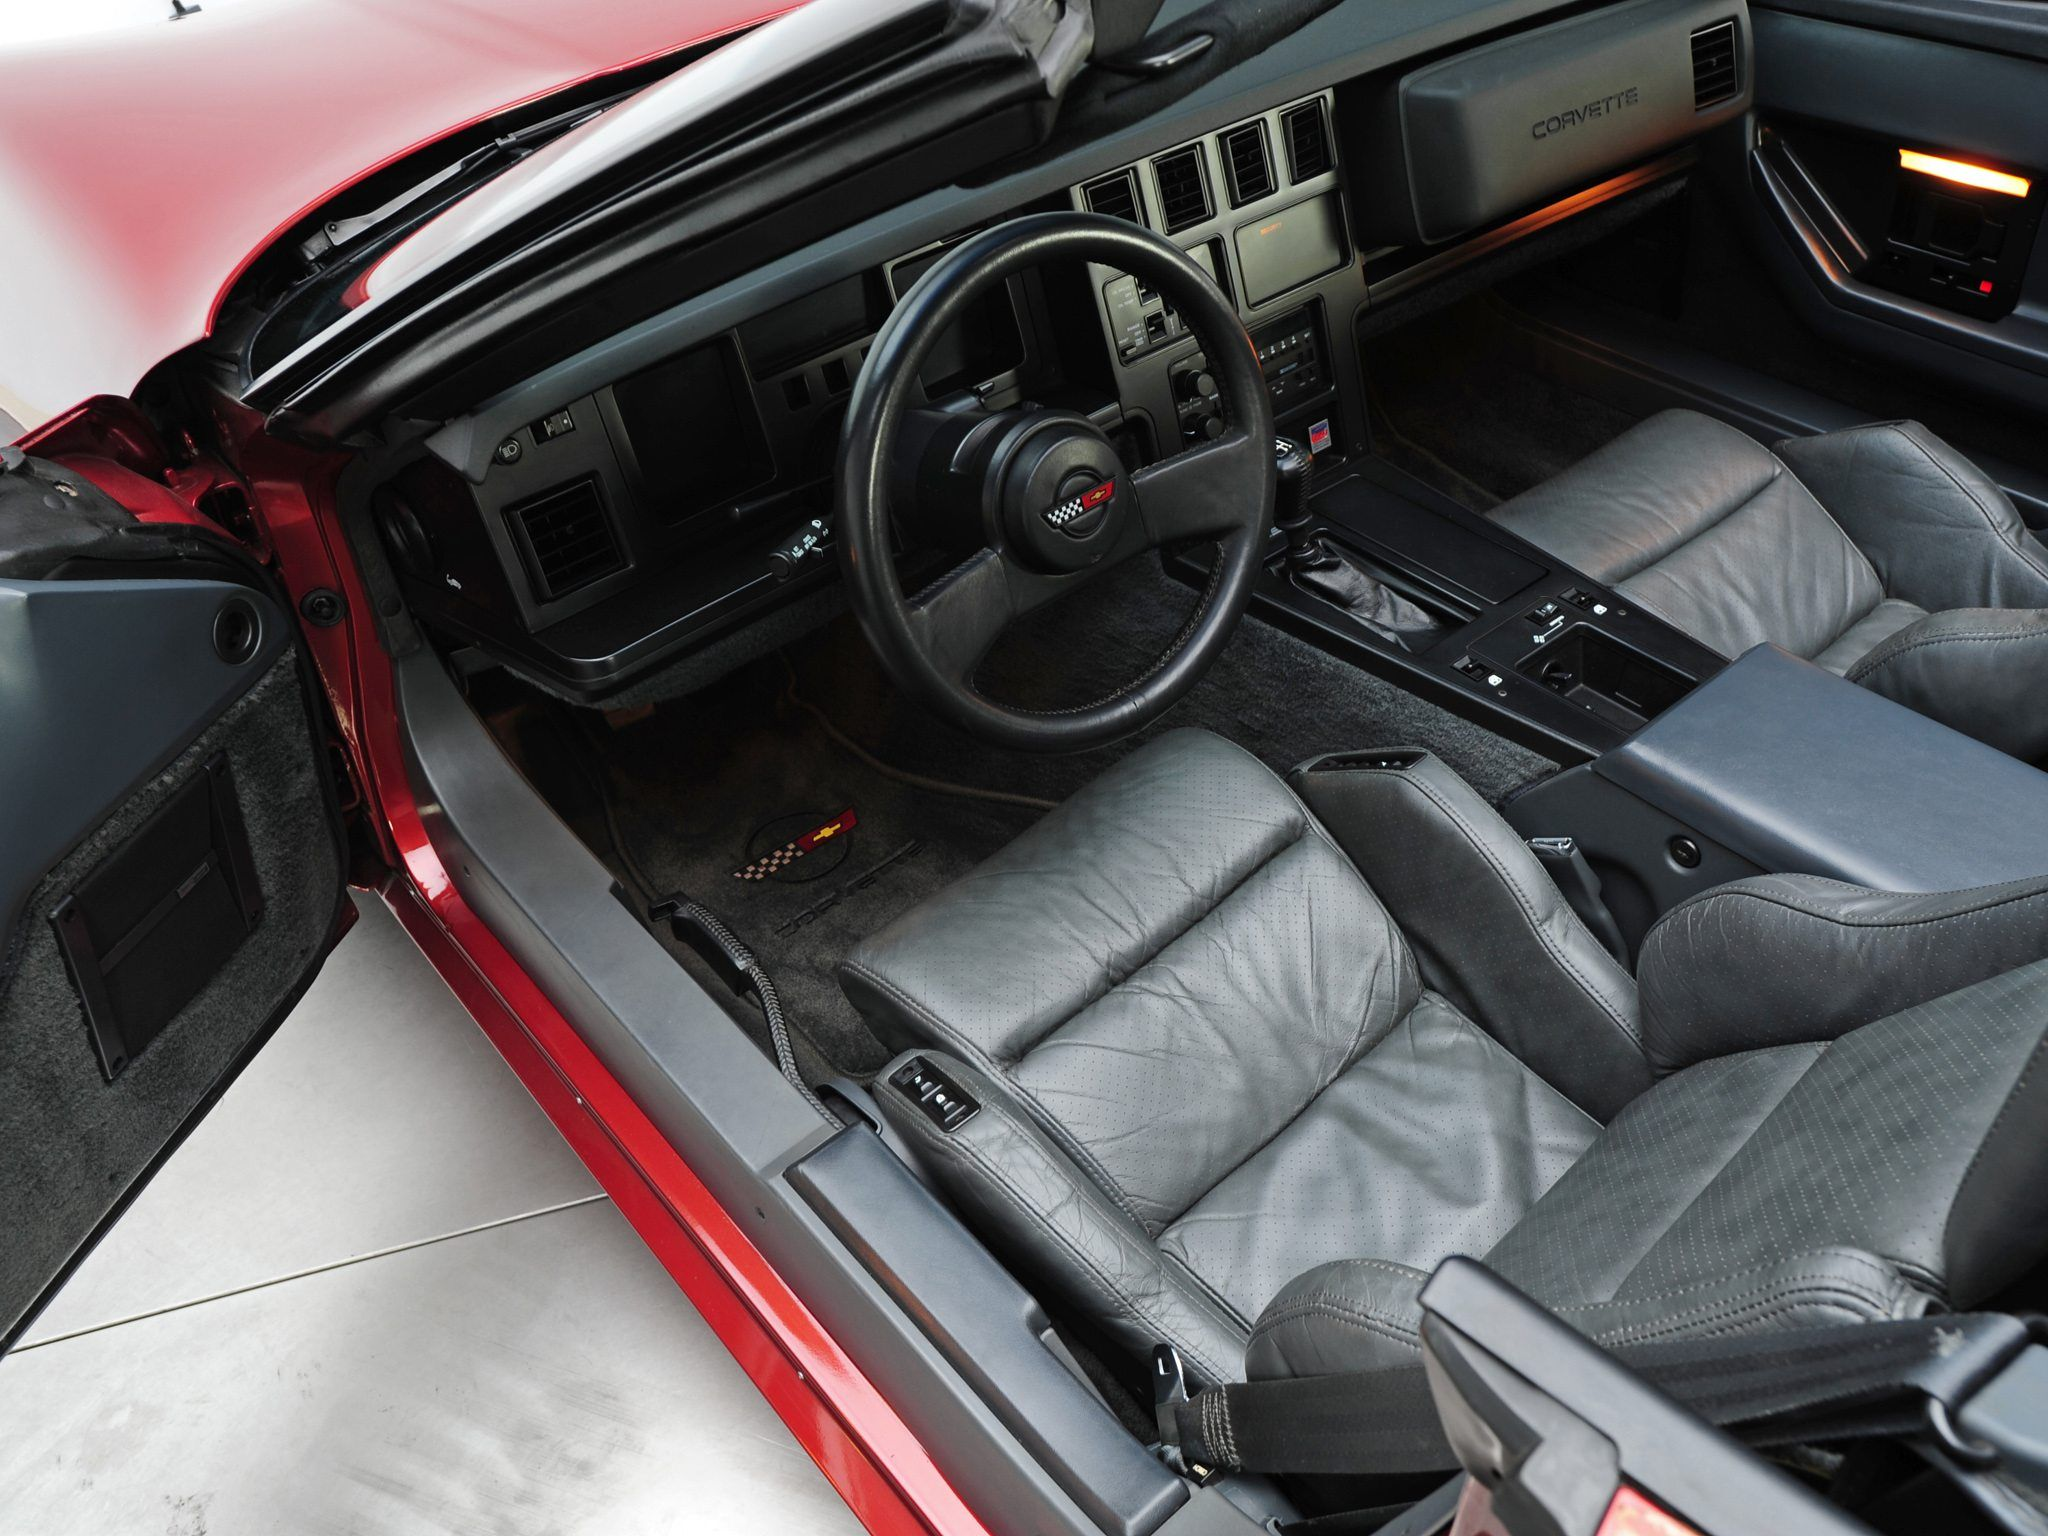 1986 C4 Corvette | C4 Corvettes | Corvette, Corvette c4